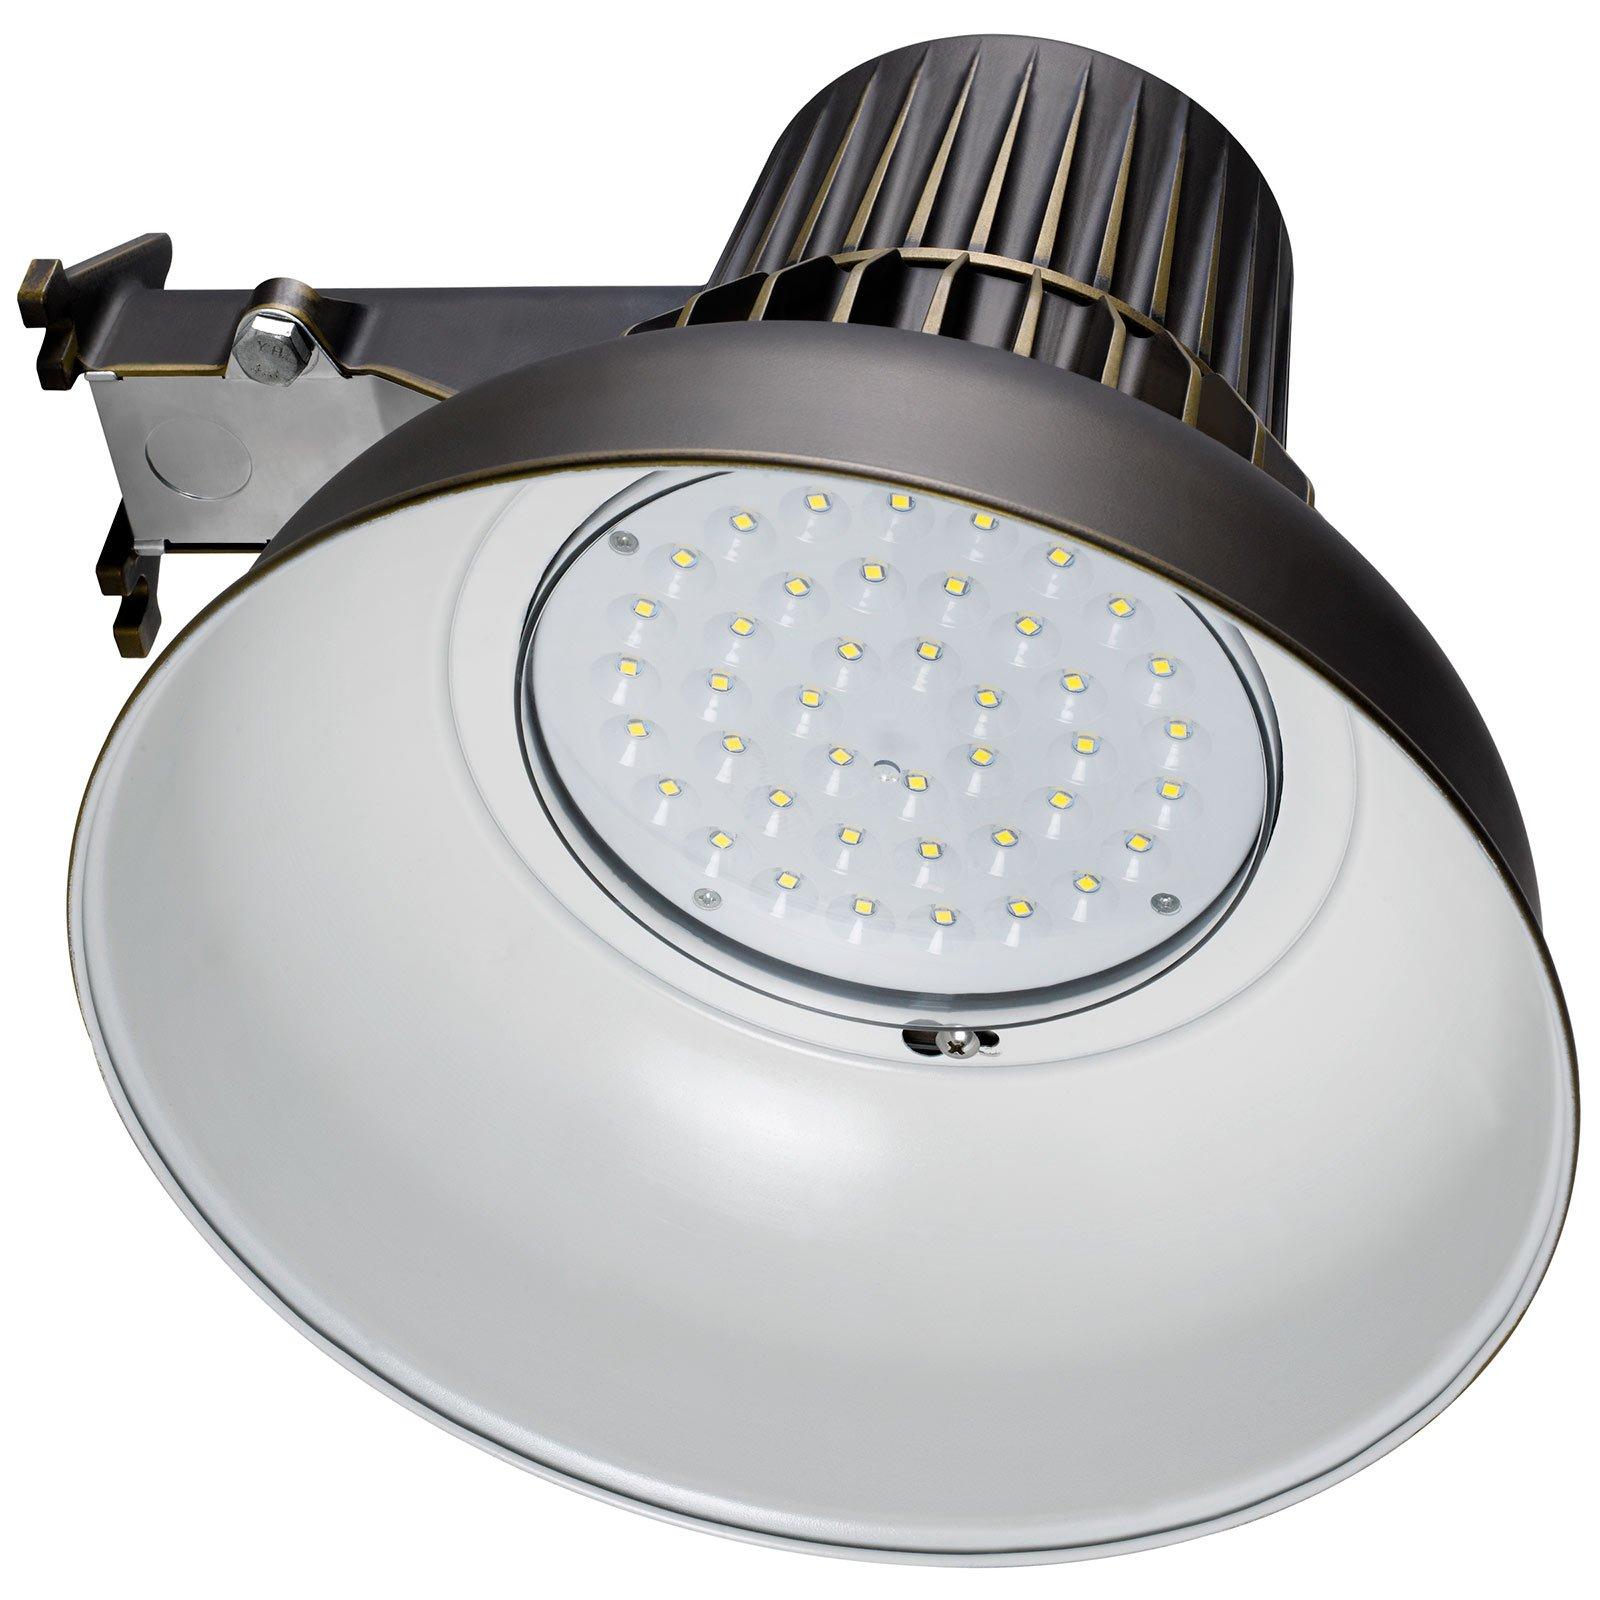 Honeywell MA0251 Led Utility Light 3500 Lumen Dusk to Dawn